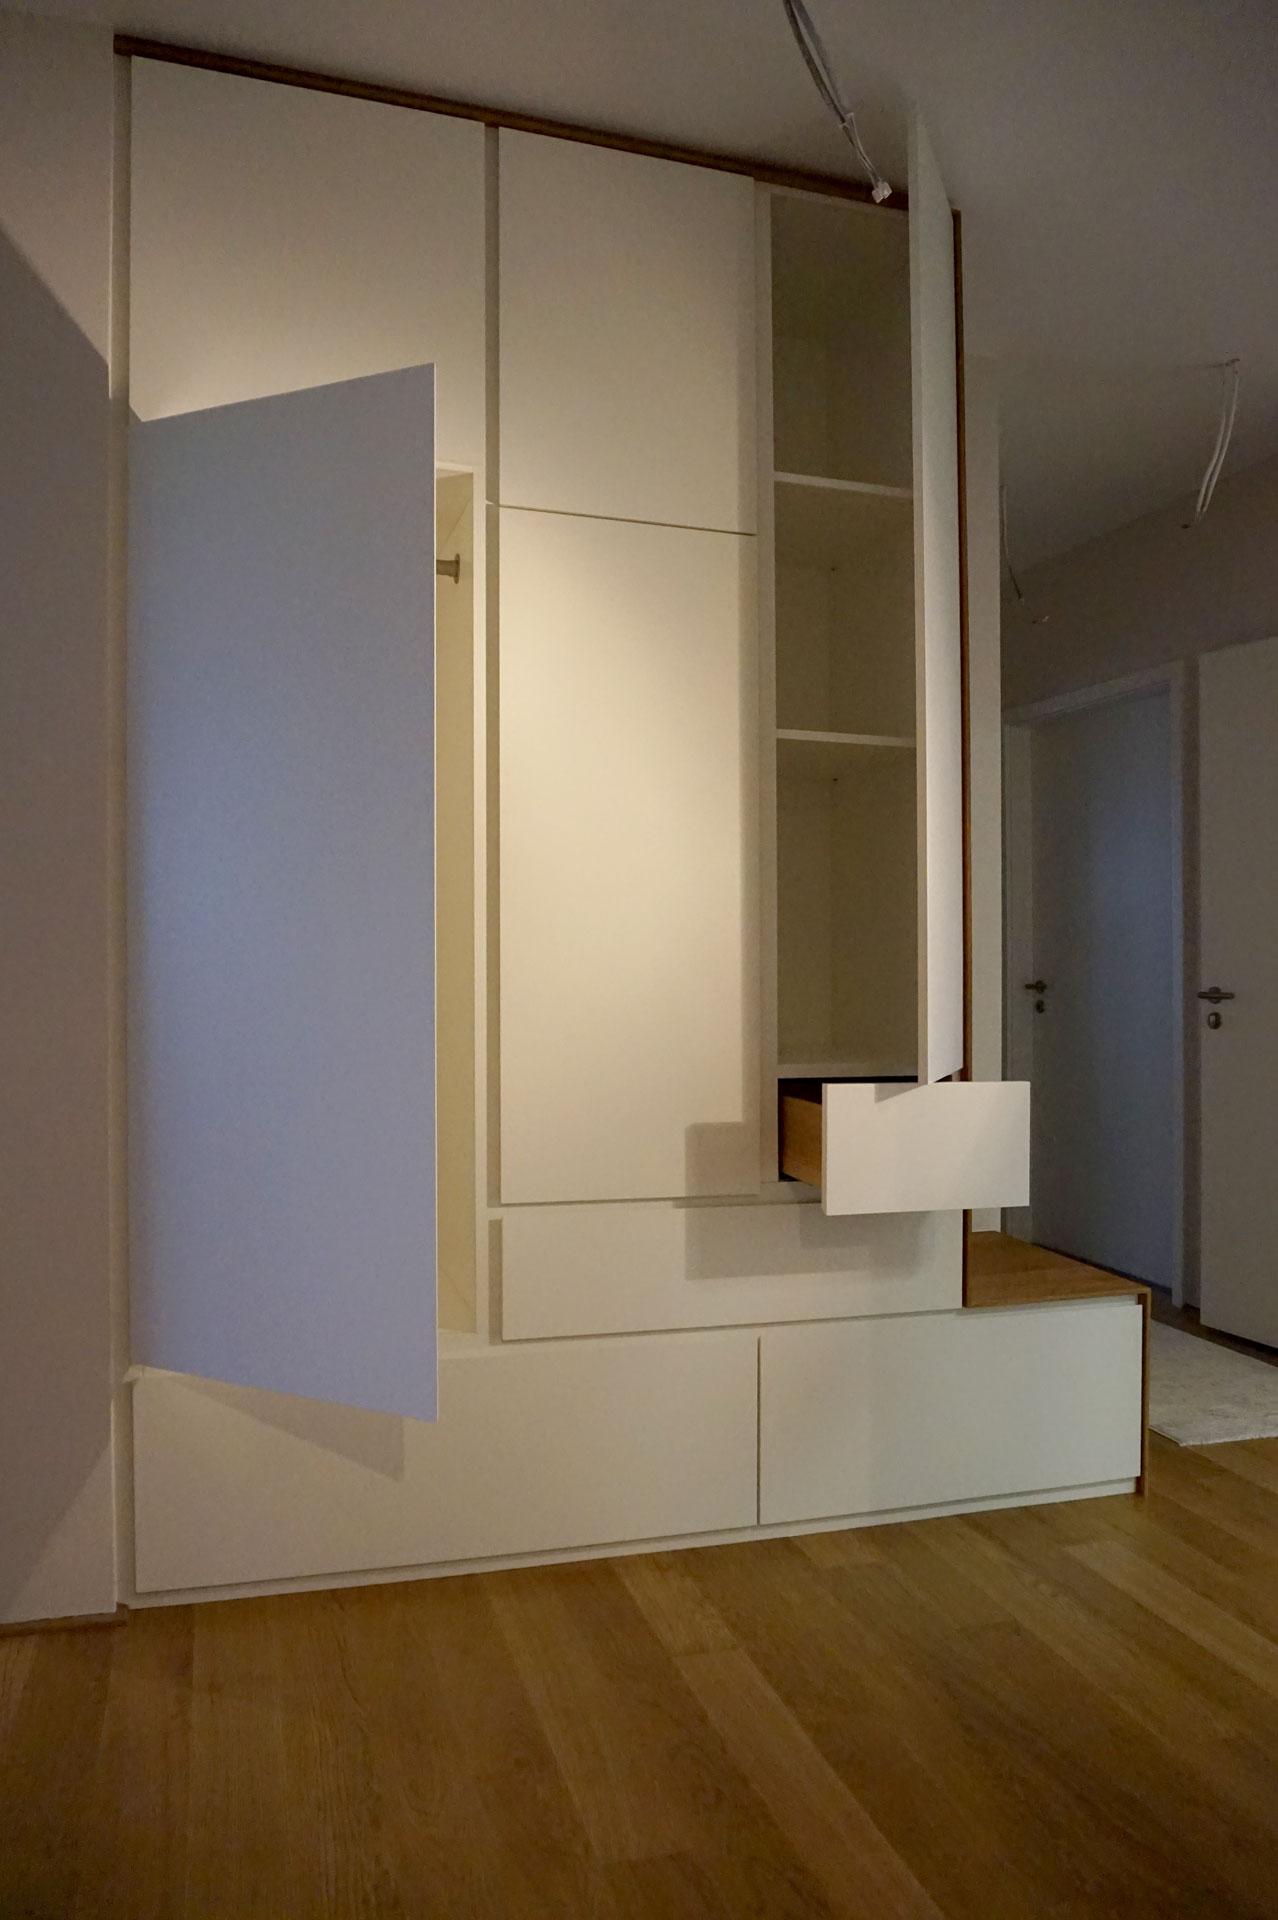 massivholz garderobe coole garderobe ruderset modern. Black Bedroom Furniture Sets. Home Design Ideas